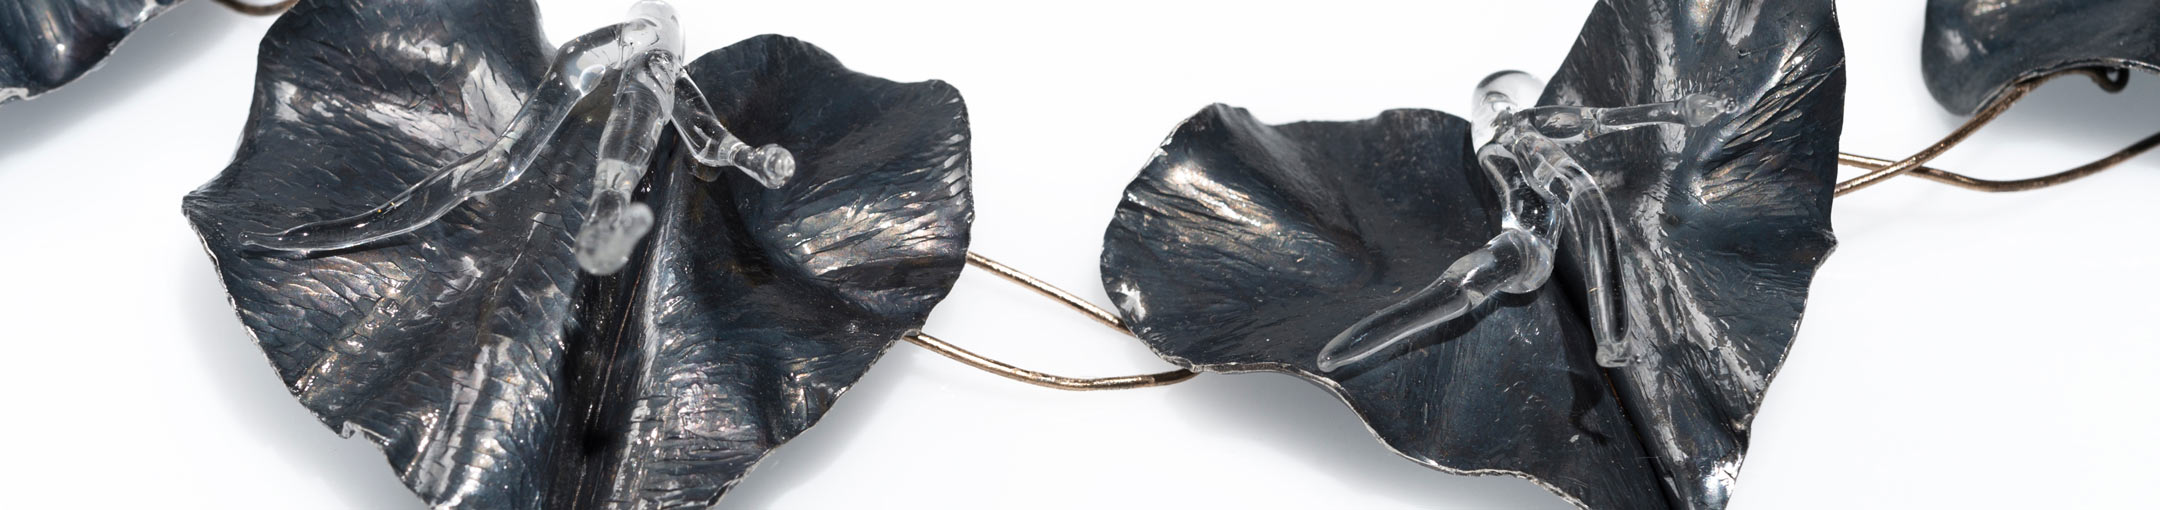 Metals and Jewelry Design BFA | Rochester Institute of